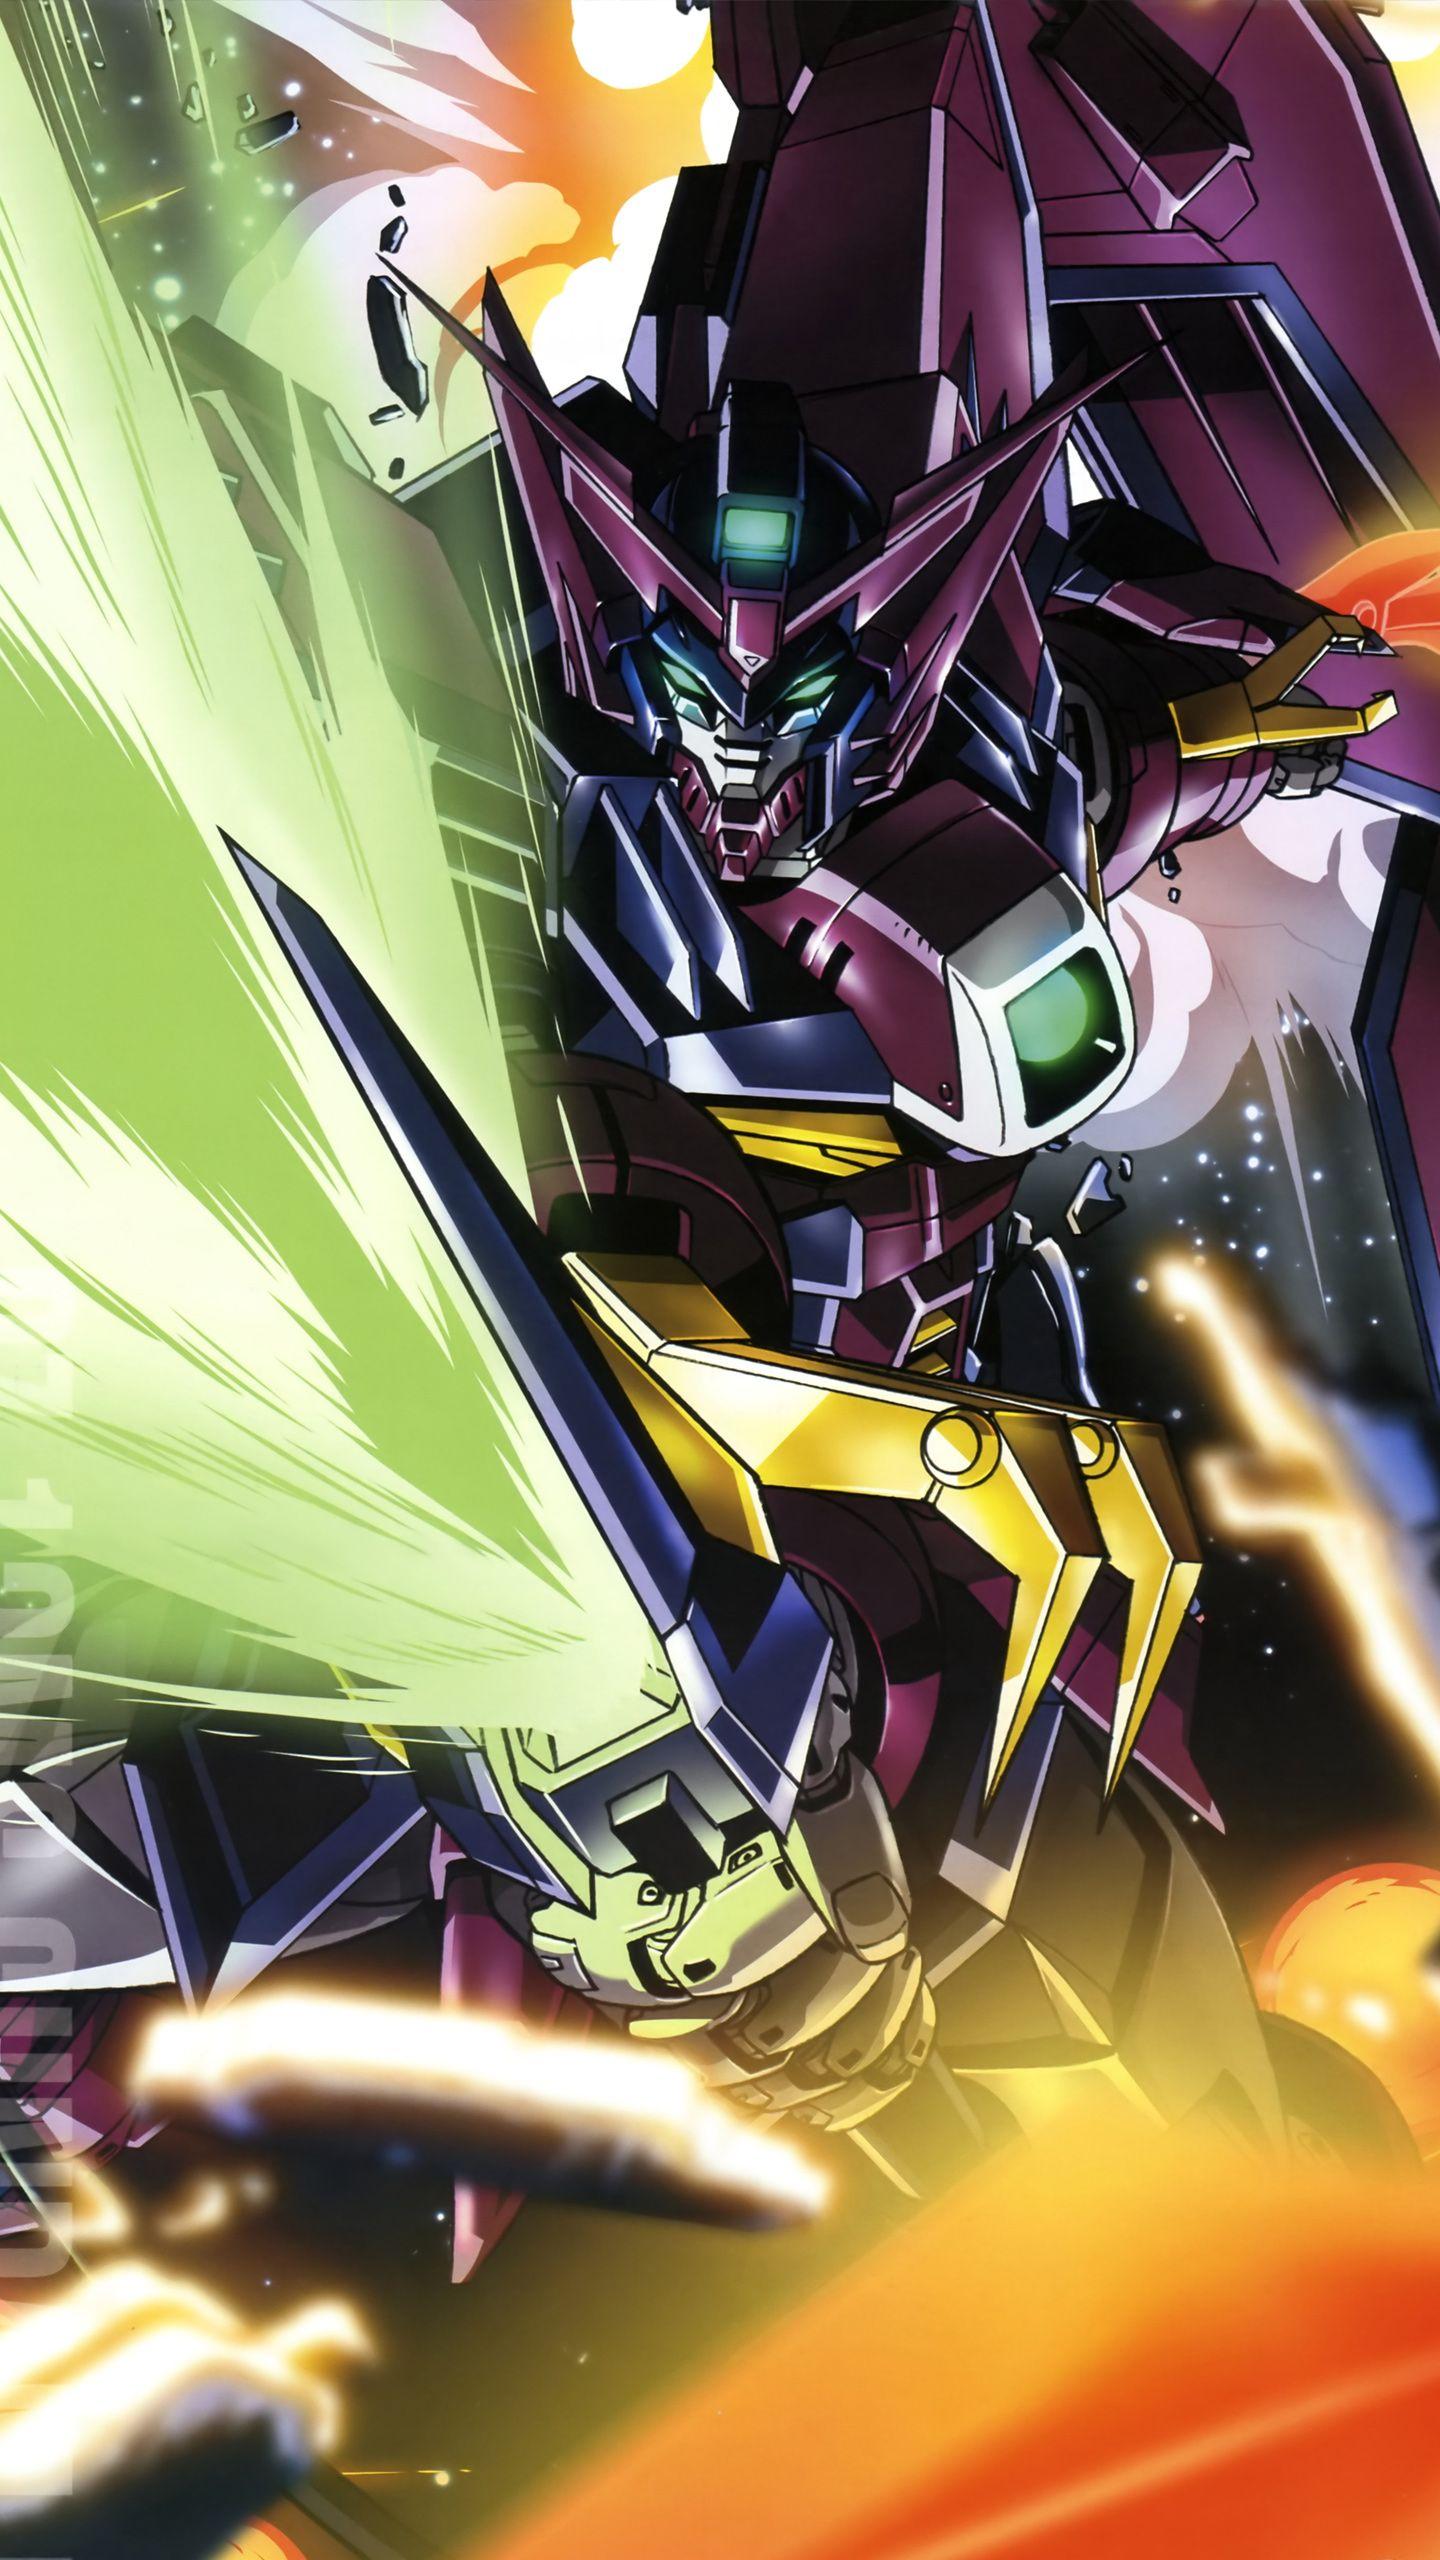 Gundam Wallpaper 1440x2560 mywallpapers site